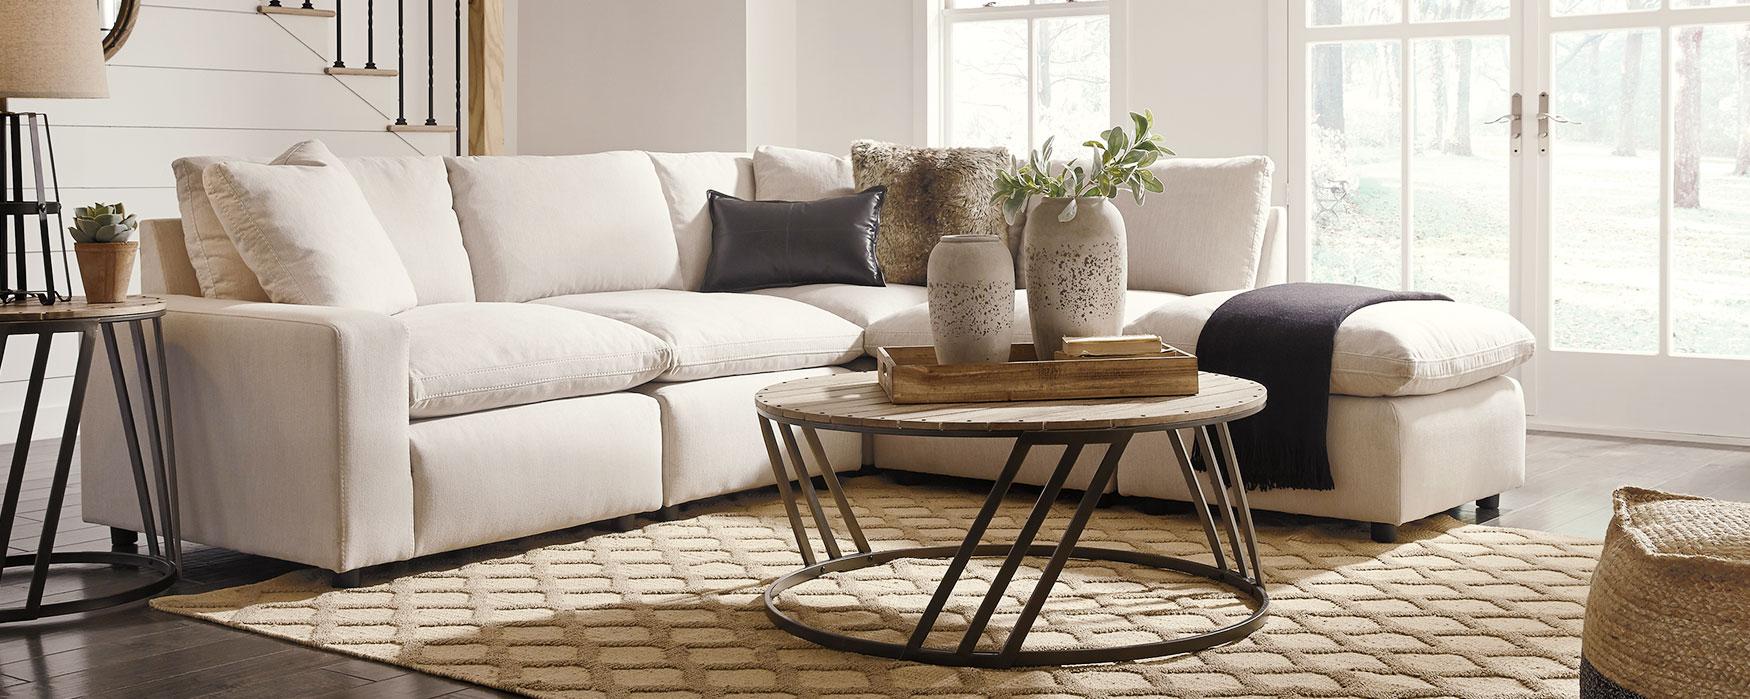 Terrific Jaxco Mattress Bedroom Living Room Furniture Store In Interior Design Ideas Skatsoteloinfo